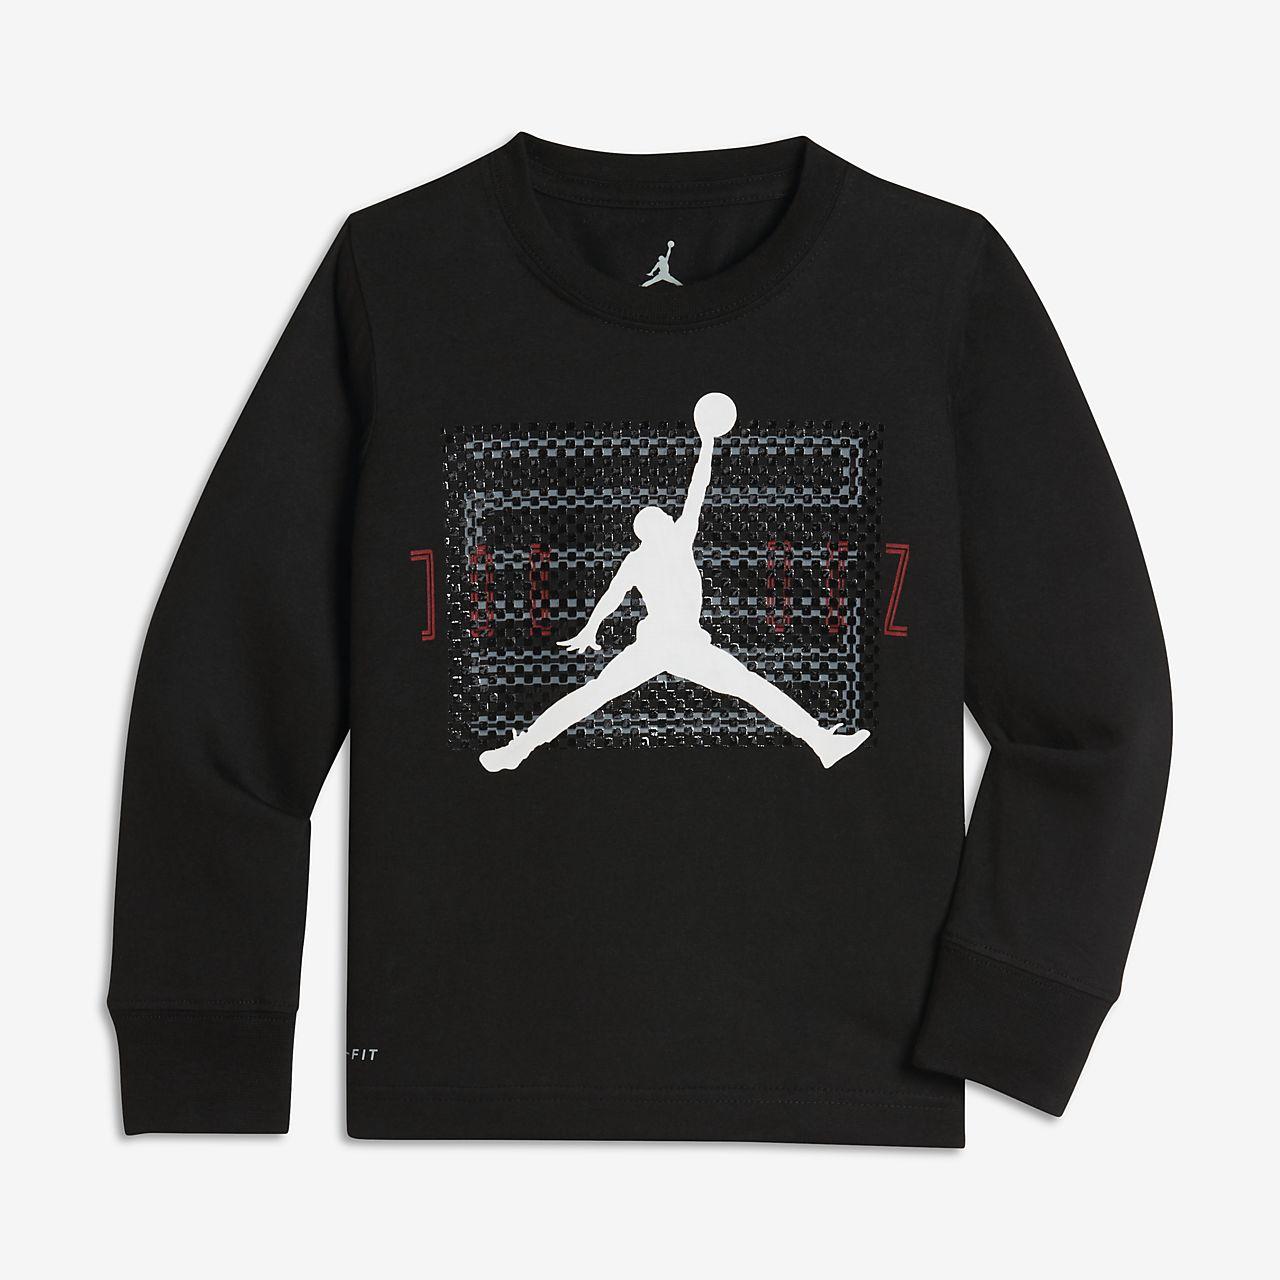 c59817066f8c Jordan Dri-FIT Retro 11 Younger Kids  (Boys ) Long-Sleeve T-Shirt ...